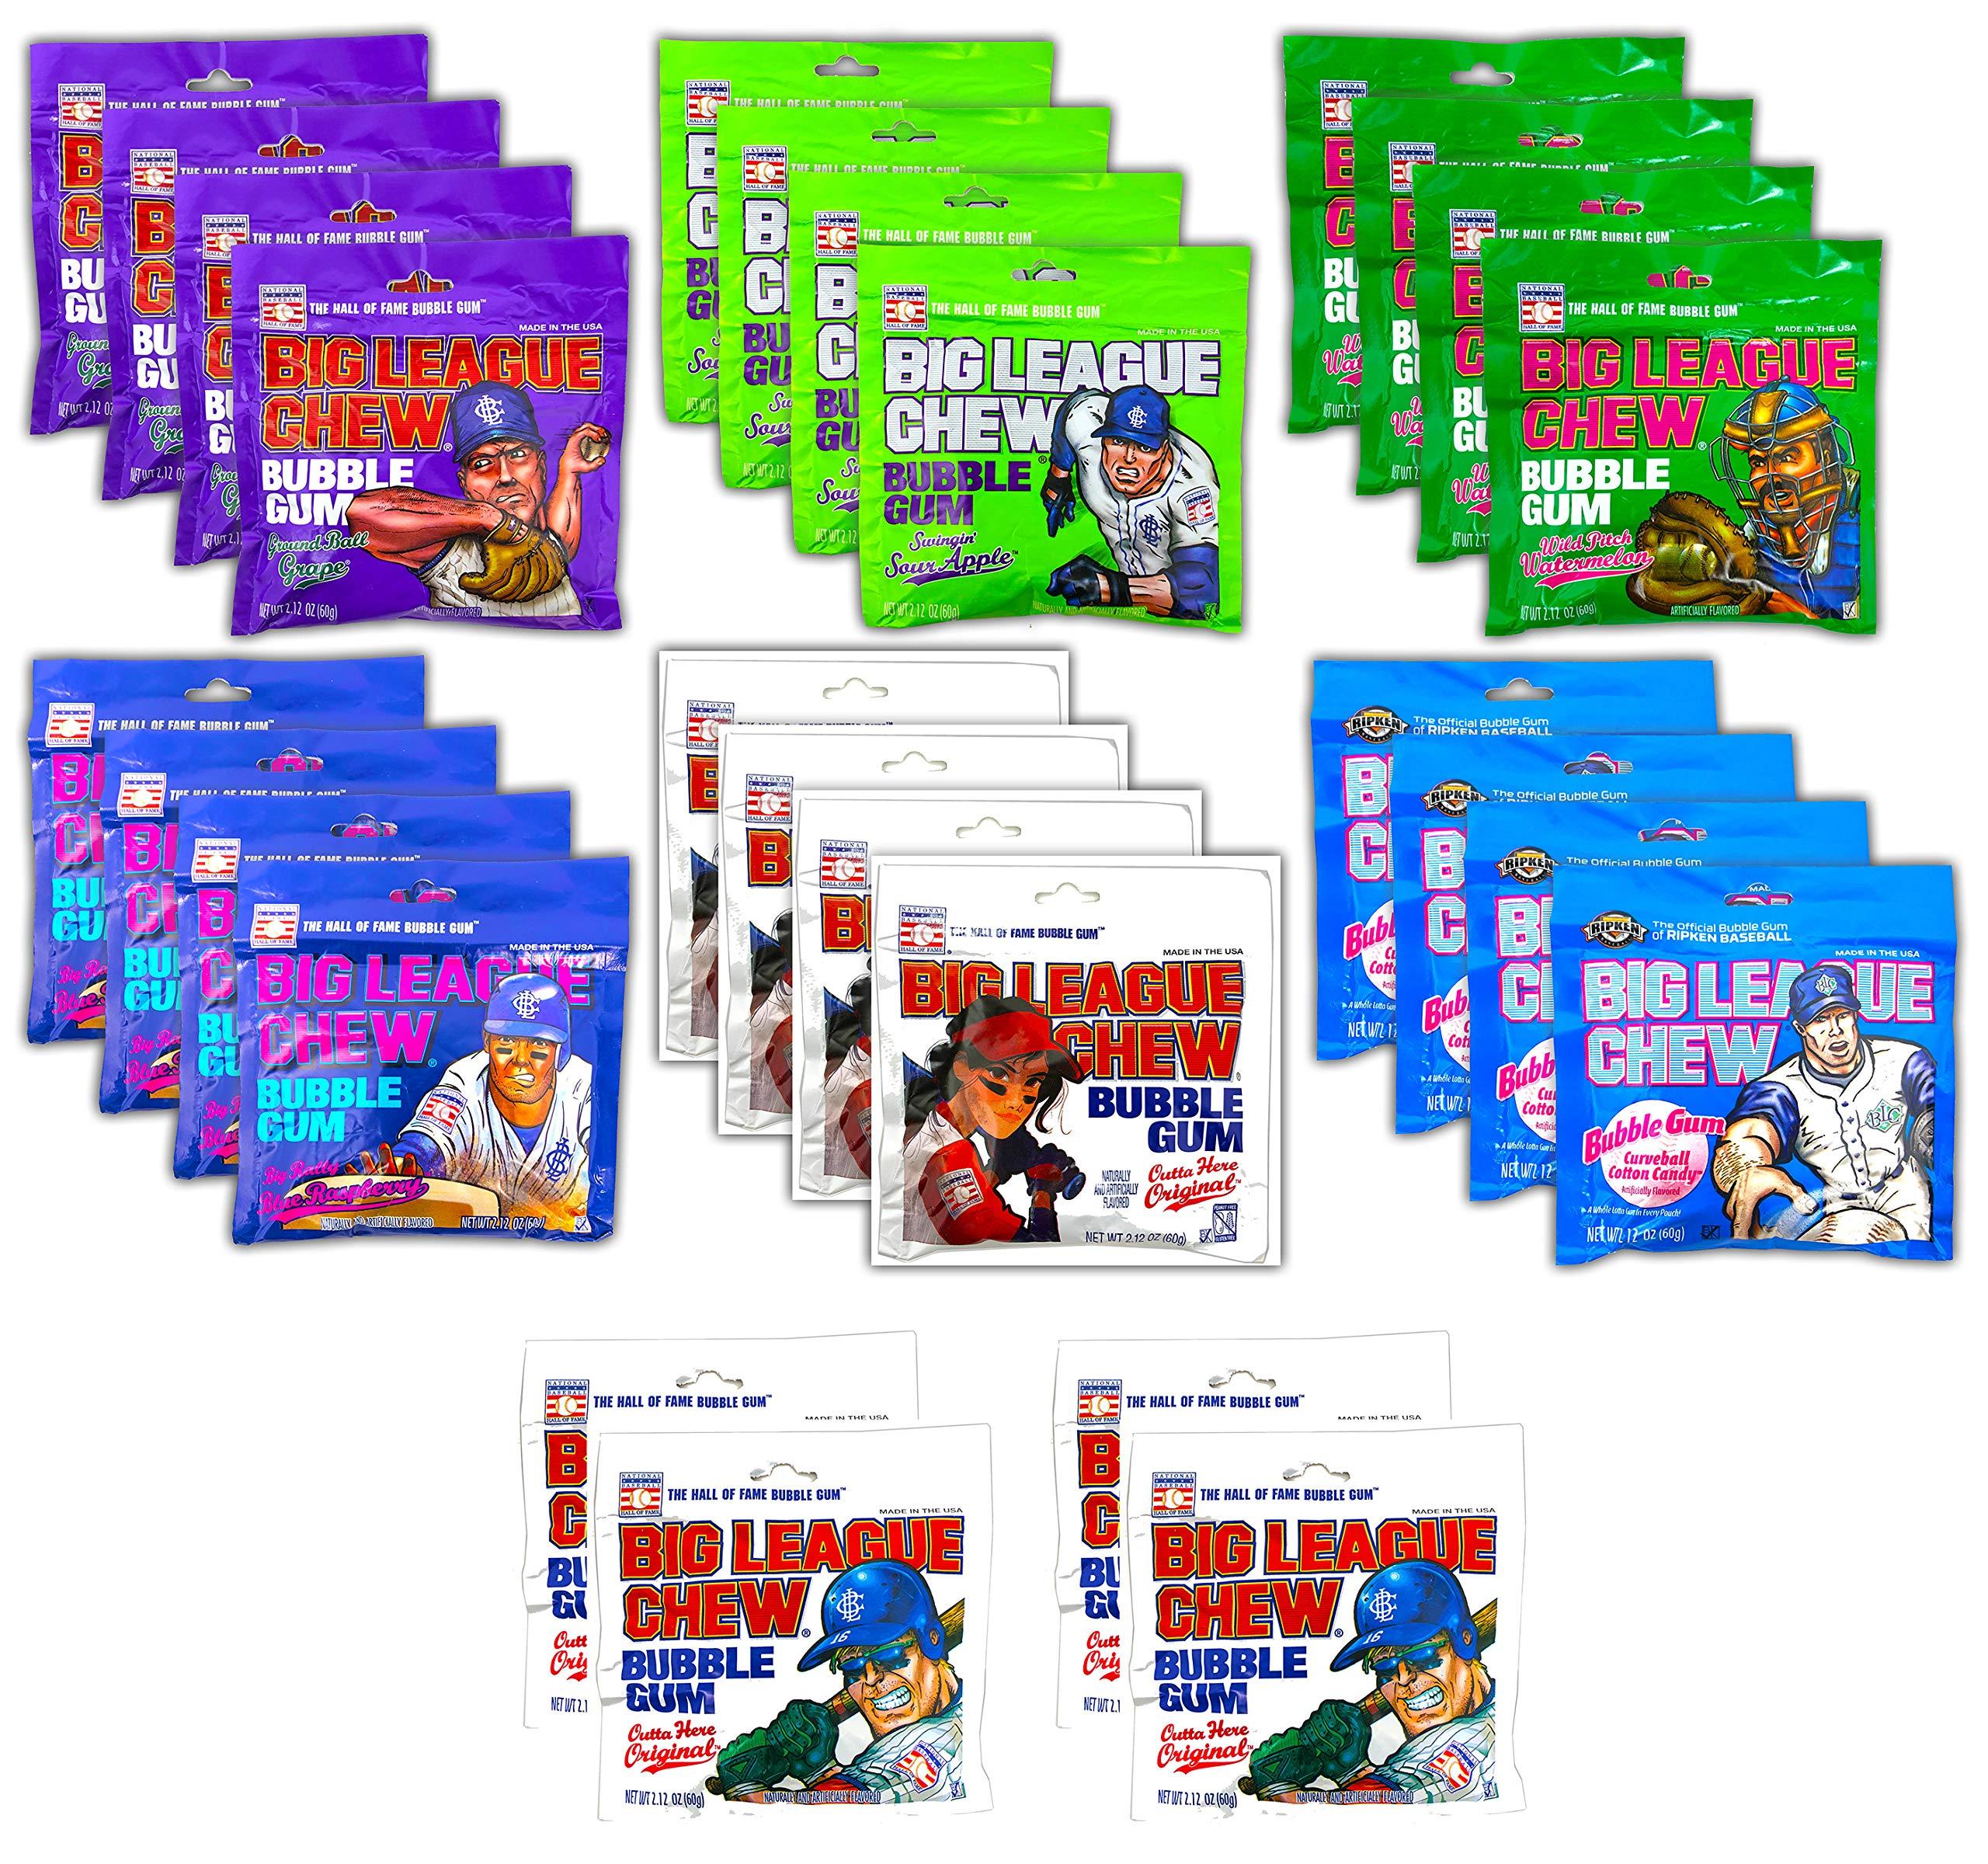 Big League Chew Bubble Gum Variety Pack 7 Flavors - Gum Packs for Softball Teams, Little League Teams, Baseball Teams and Baseball Fans (28 Pack) by Tru Inertia